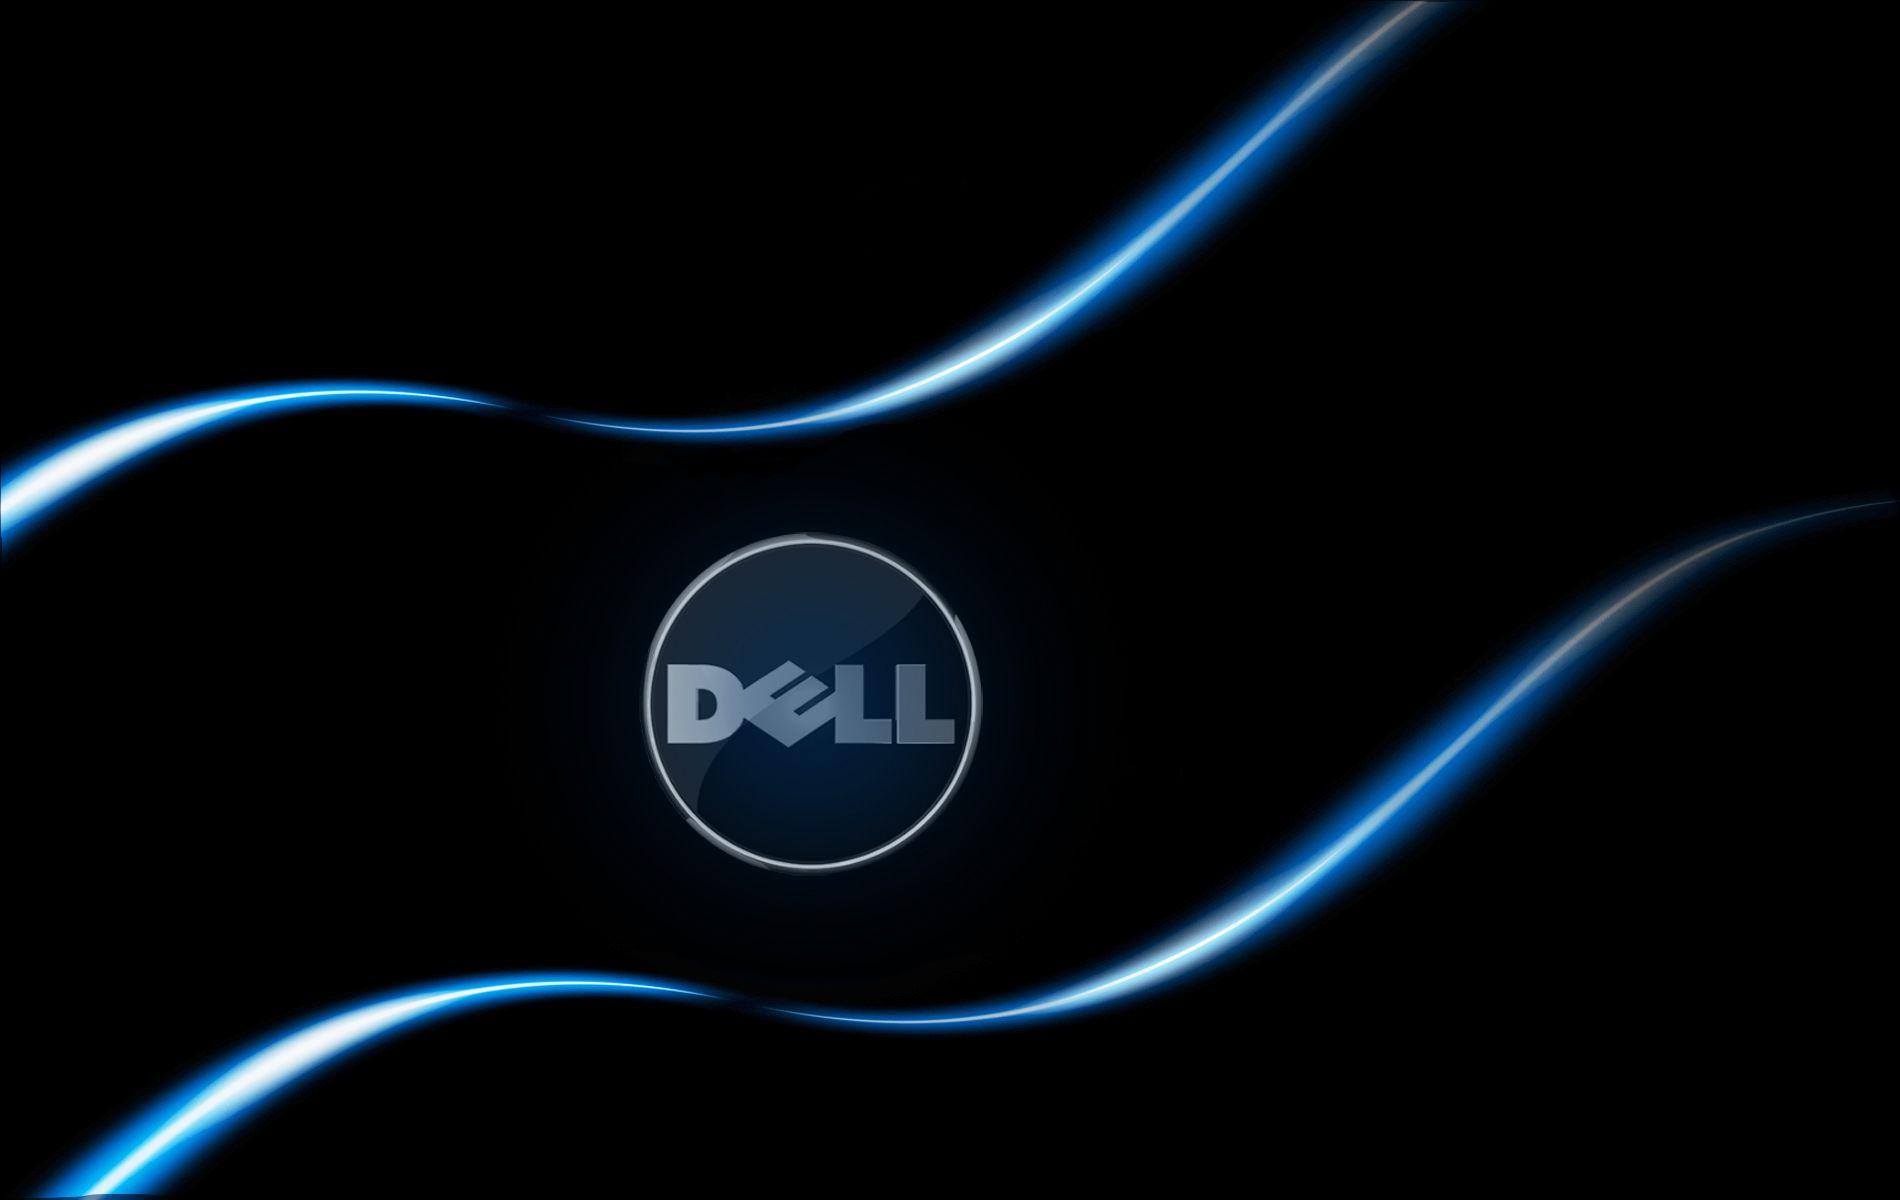 Pin By Raghavendra J On Dell Laptop Wallpaper Dell Logo Wallpaper